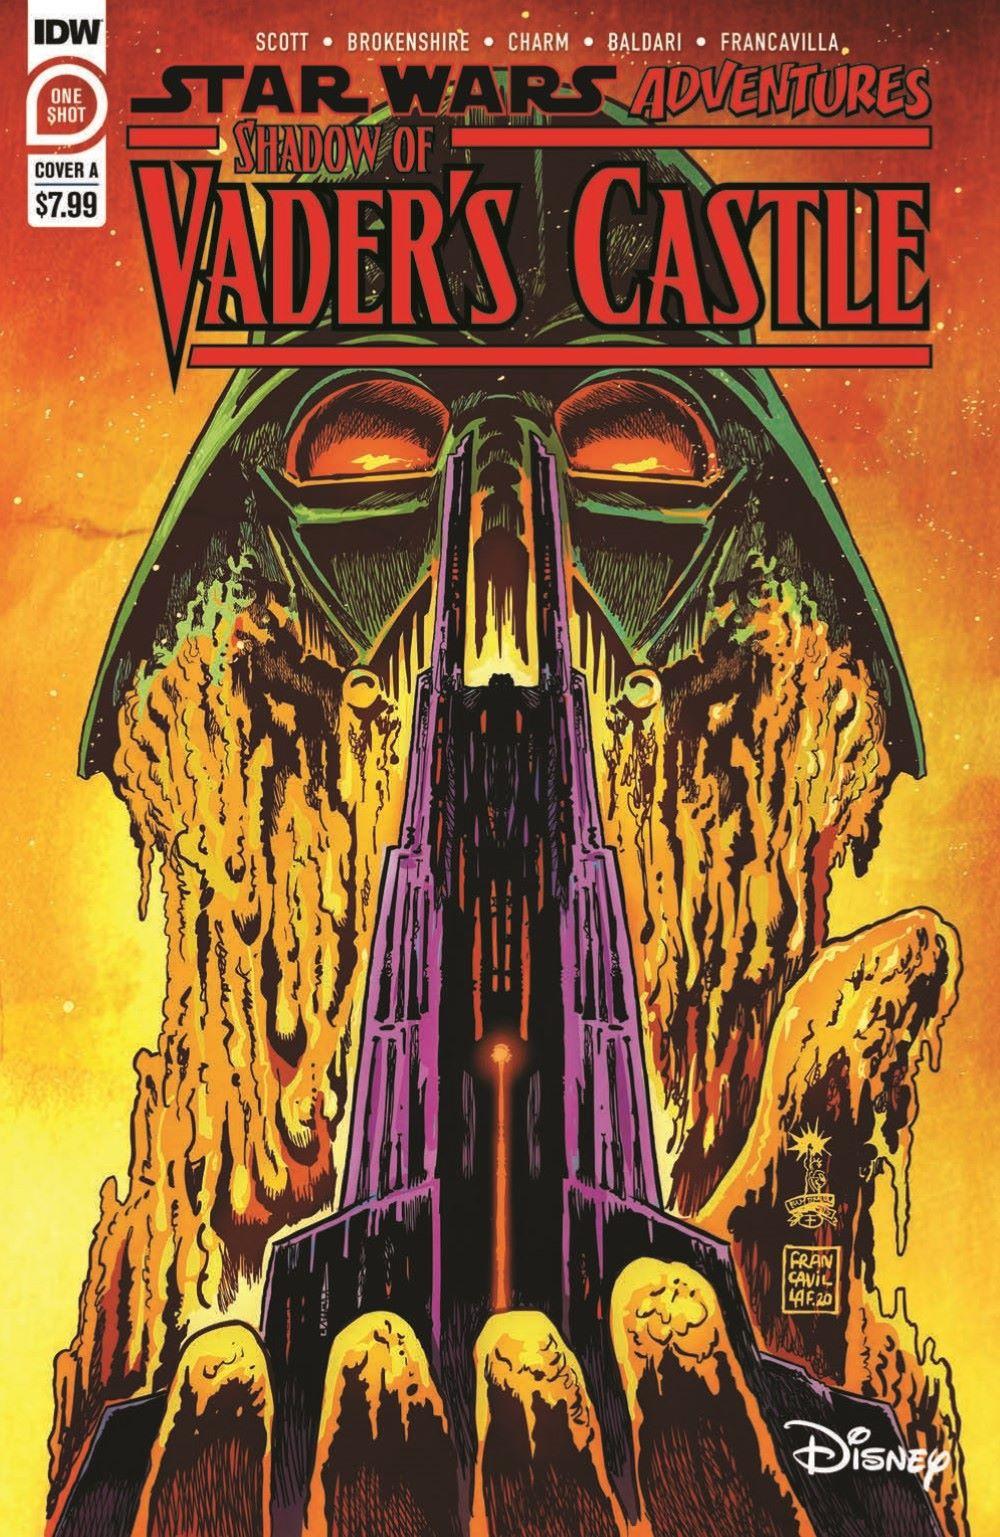 SW_ShadowOfVadersCastle_01-pr-1 ComicList Previews: STAR WARS ADVENTURES SHADOW OF VADER'S CASTLE #1